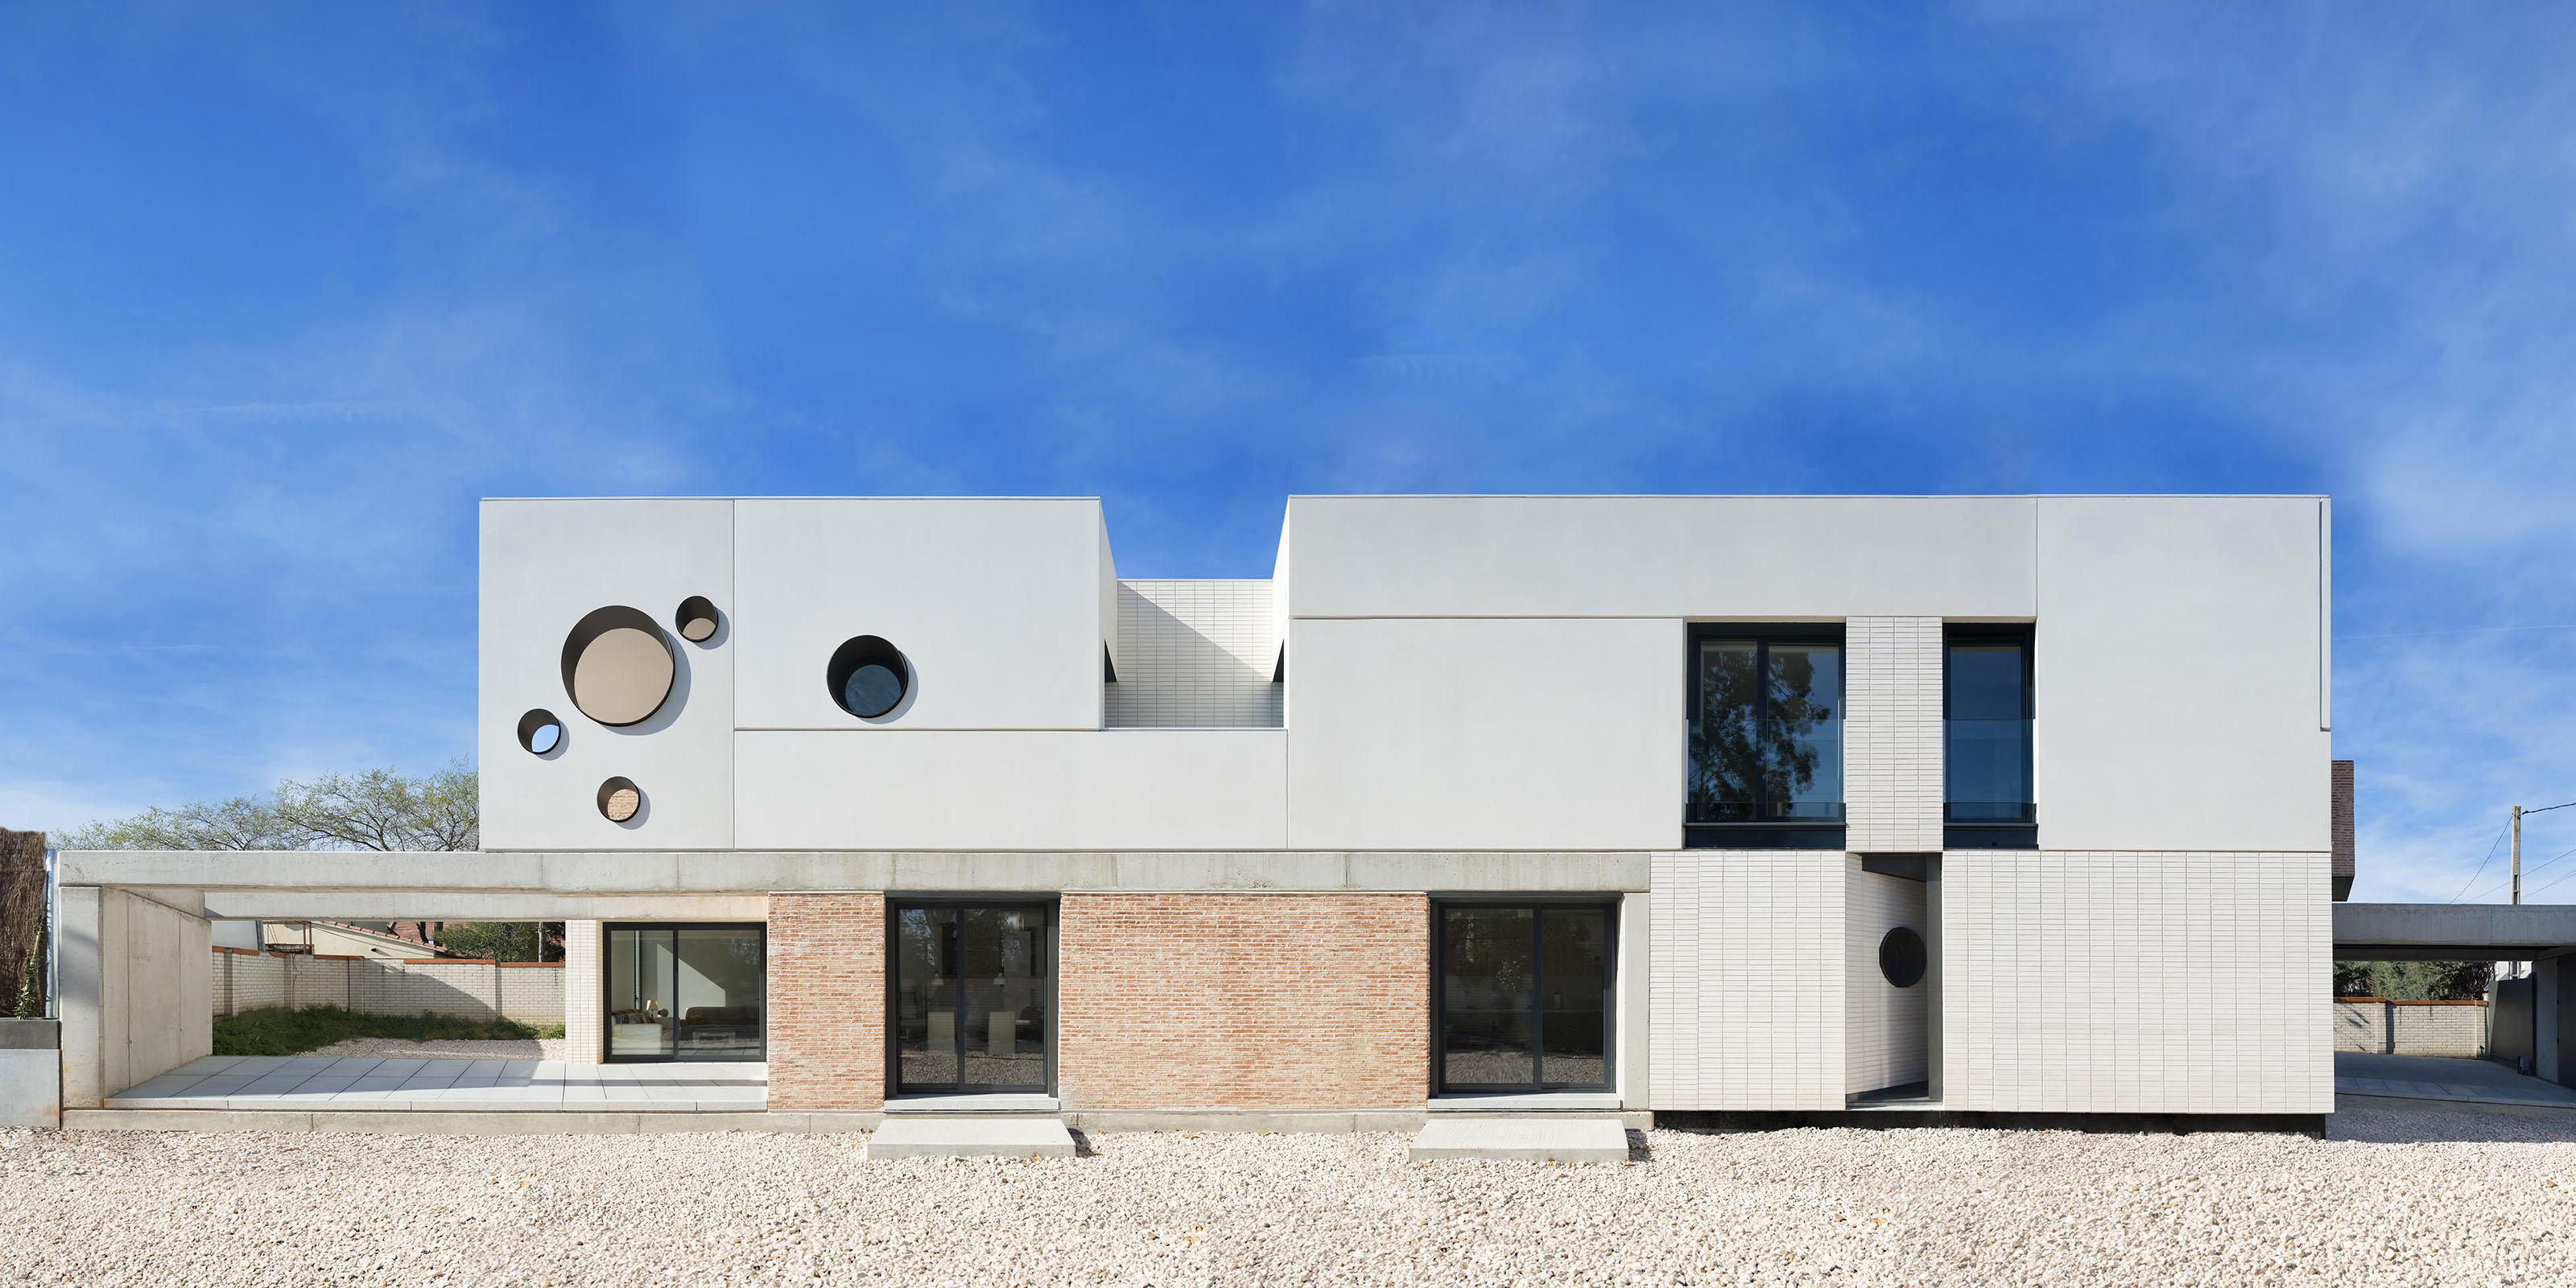 VIVIENDA_IA - LANDINEZ+REY | equipo L2G arquitectos, slp [ eL2Gaa ]